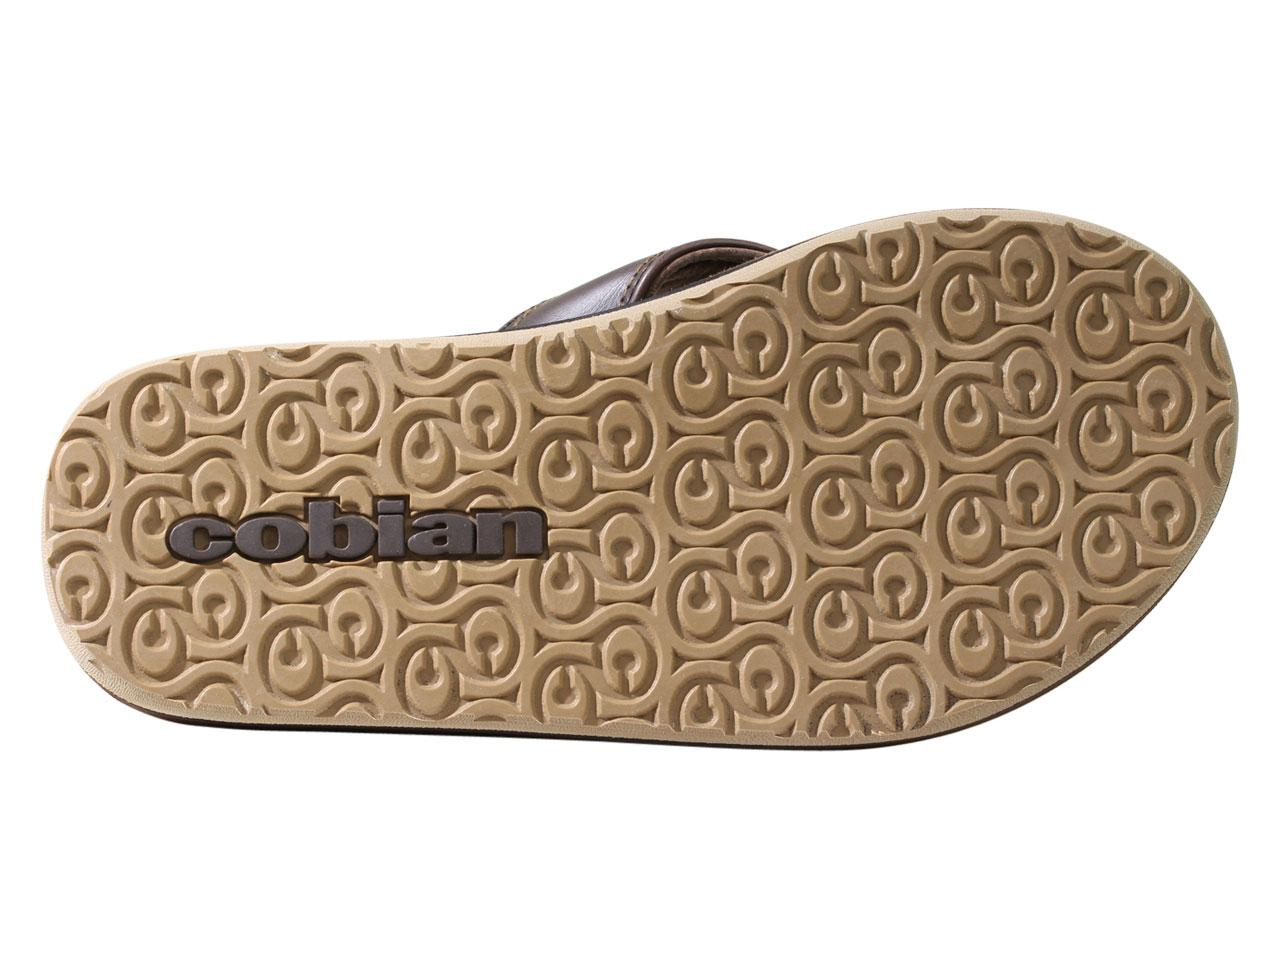 58bee2b7ea5401 Cobian Men s Movember Flip Flops Sandals Shoes by Cobian. 1234567